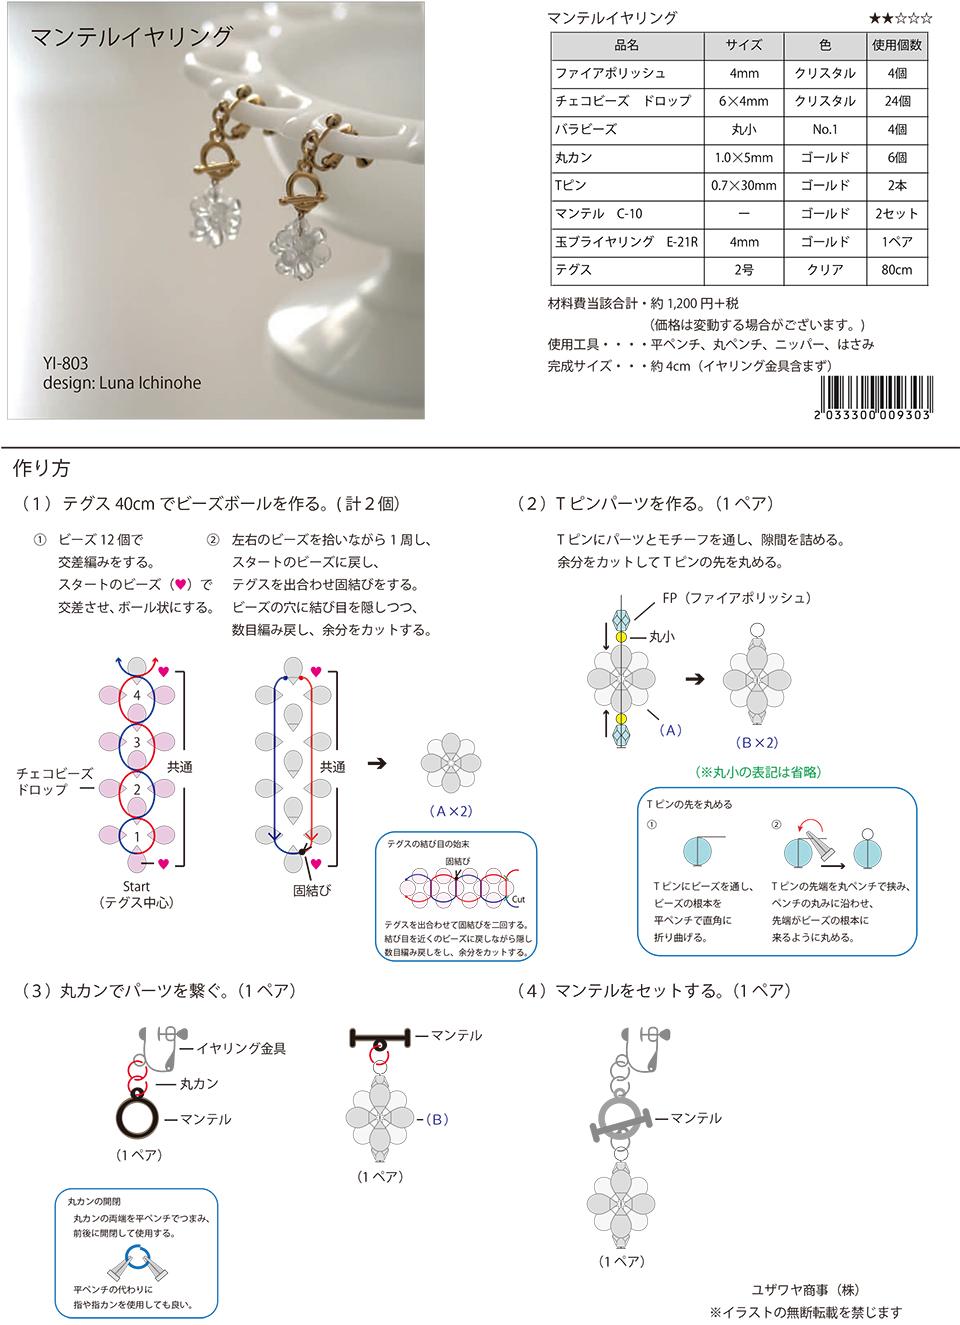 YI-803_1.jpg